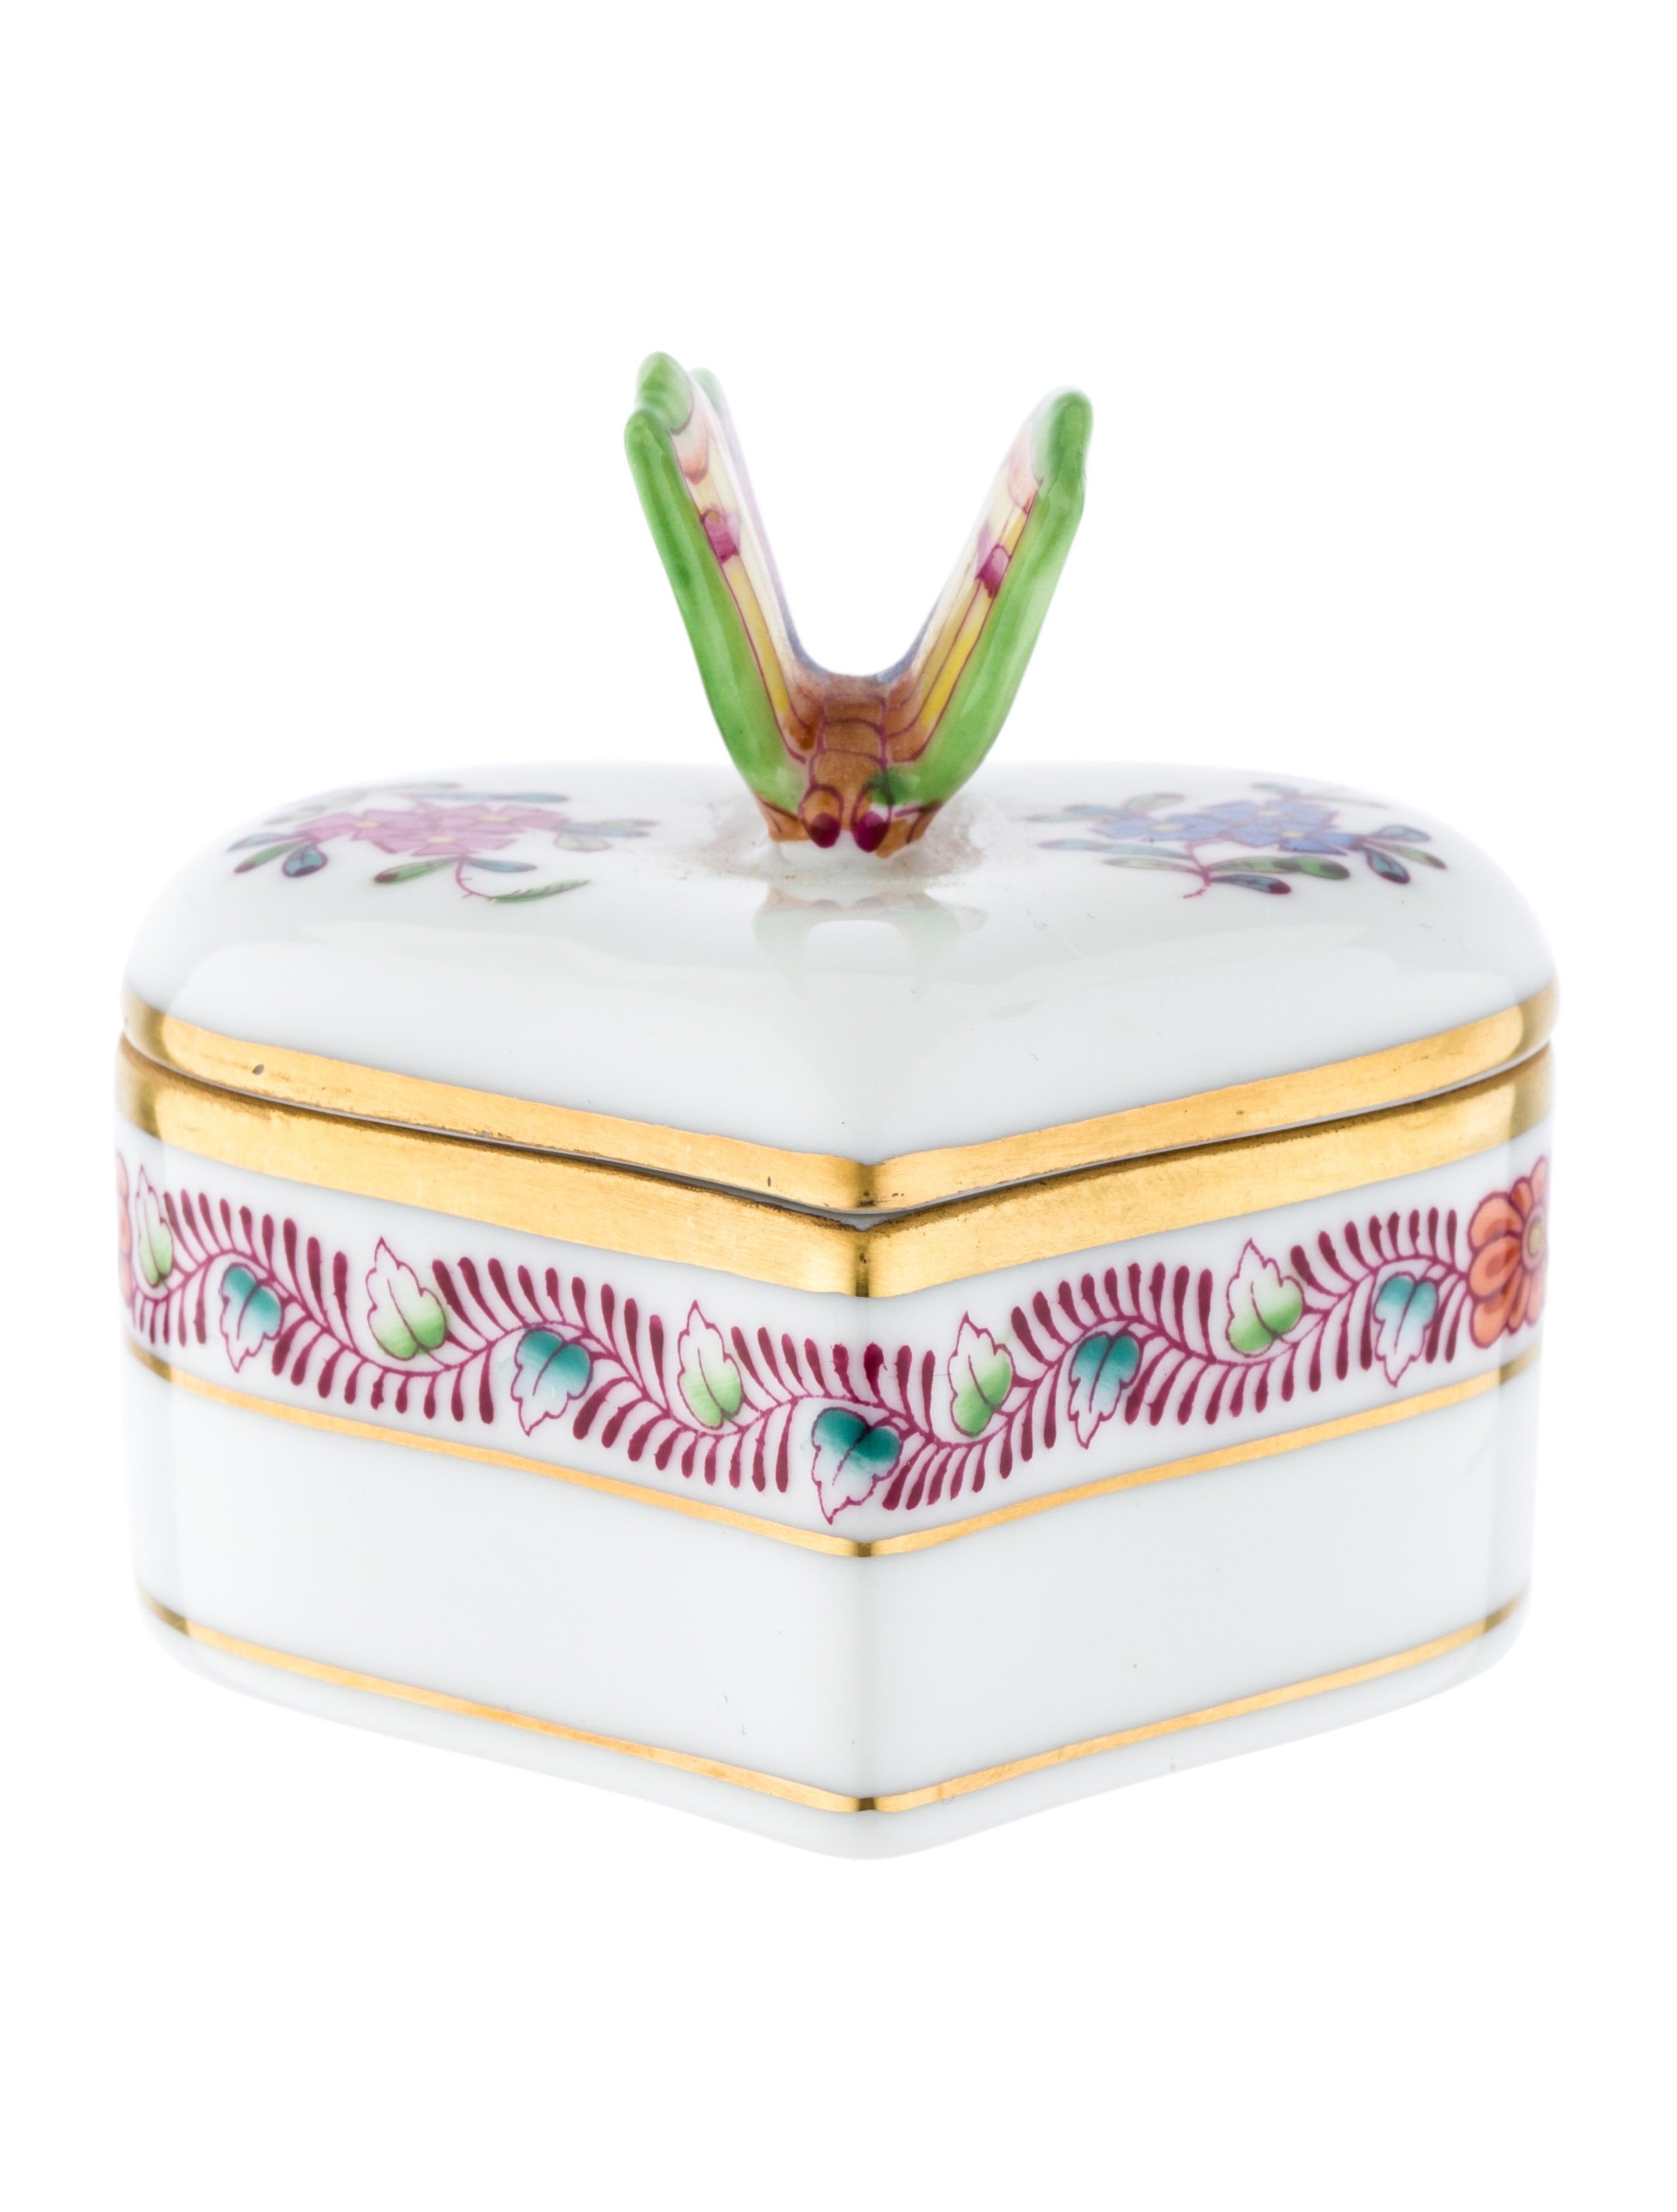 Butterfly Home Decor Accessories 12 Pcs 3 Color